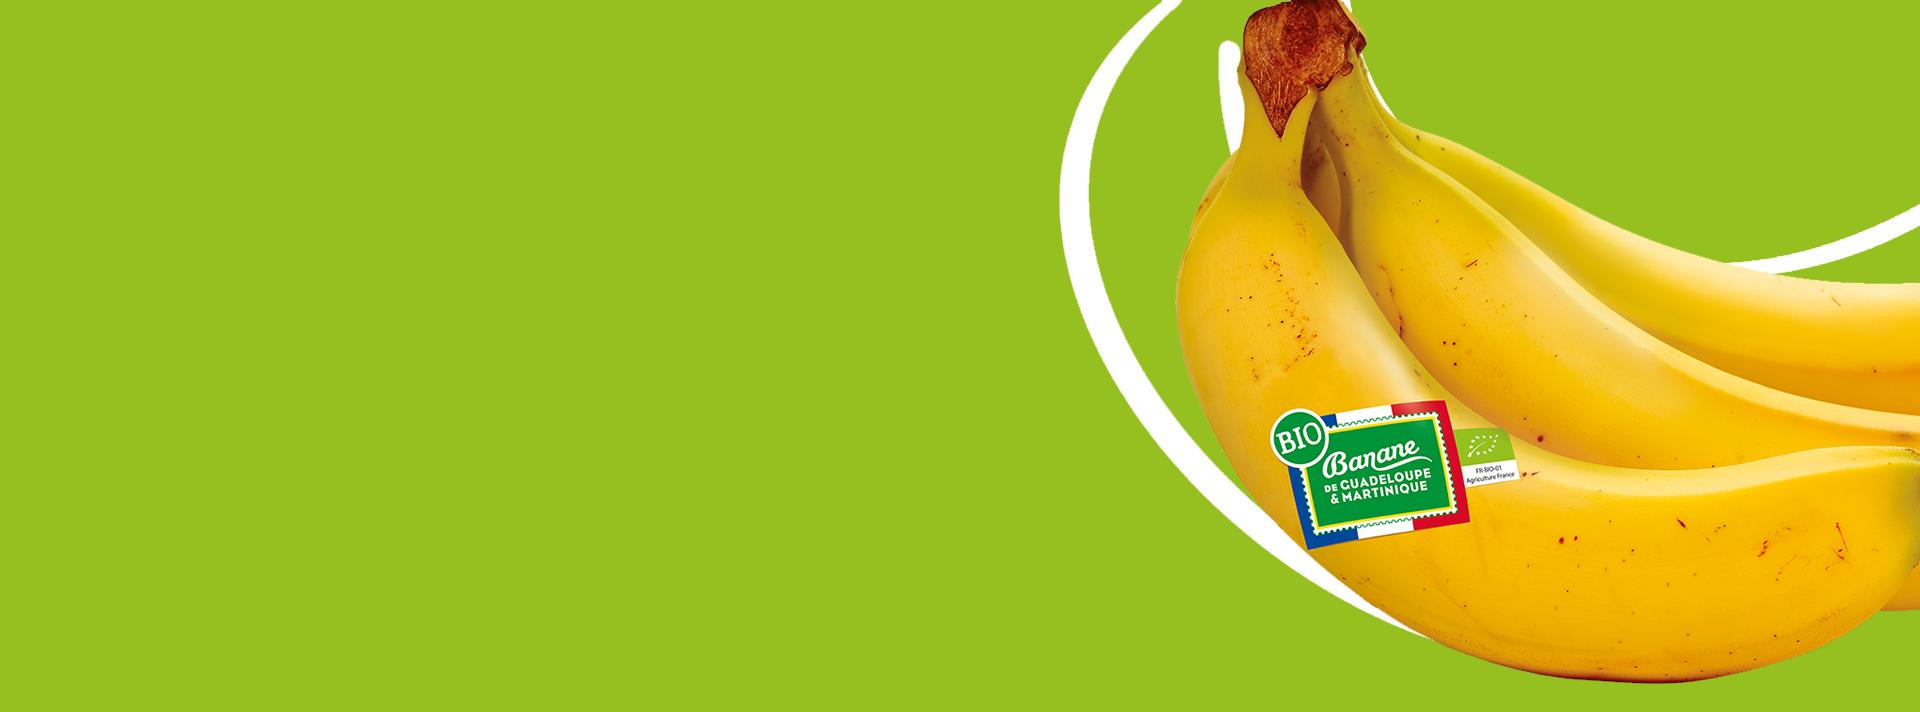 banane-bio-carrousel